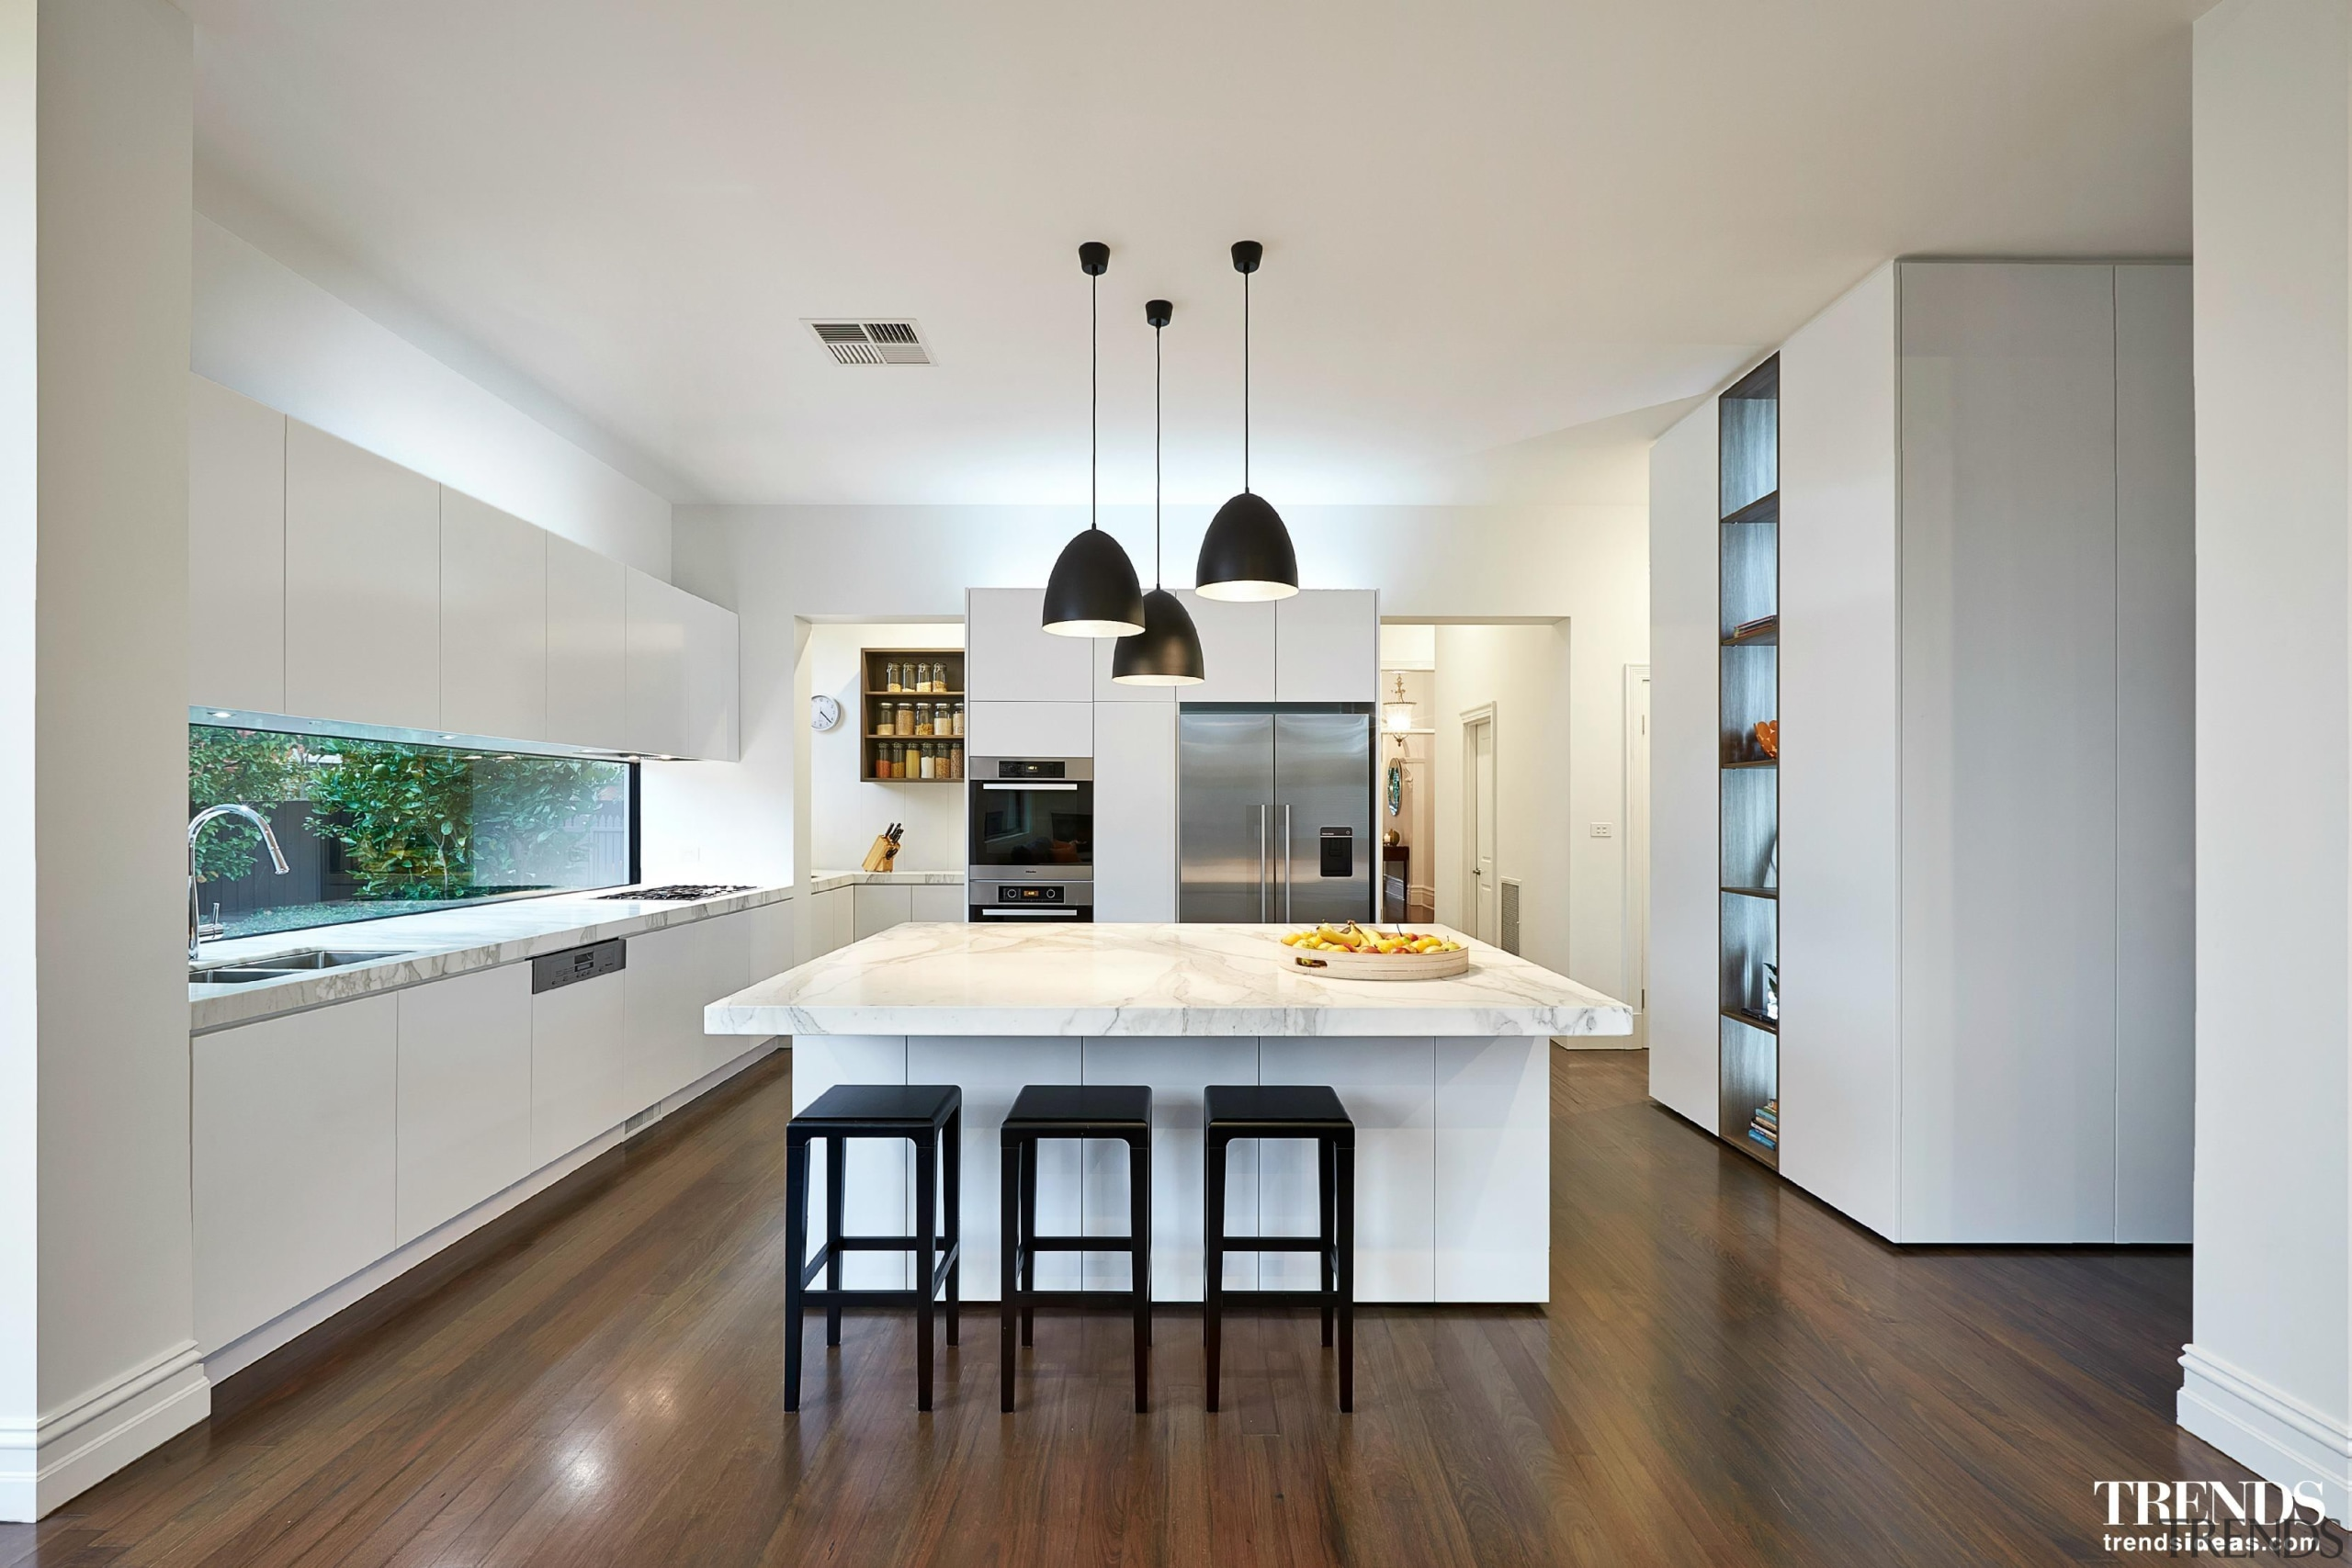 LSA Architects - countertop | floor | flooring countertop, floor, flooring, hardwood, interior design, kitchen, living room, property, real estate, room, wood flooring, gray